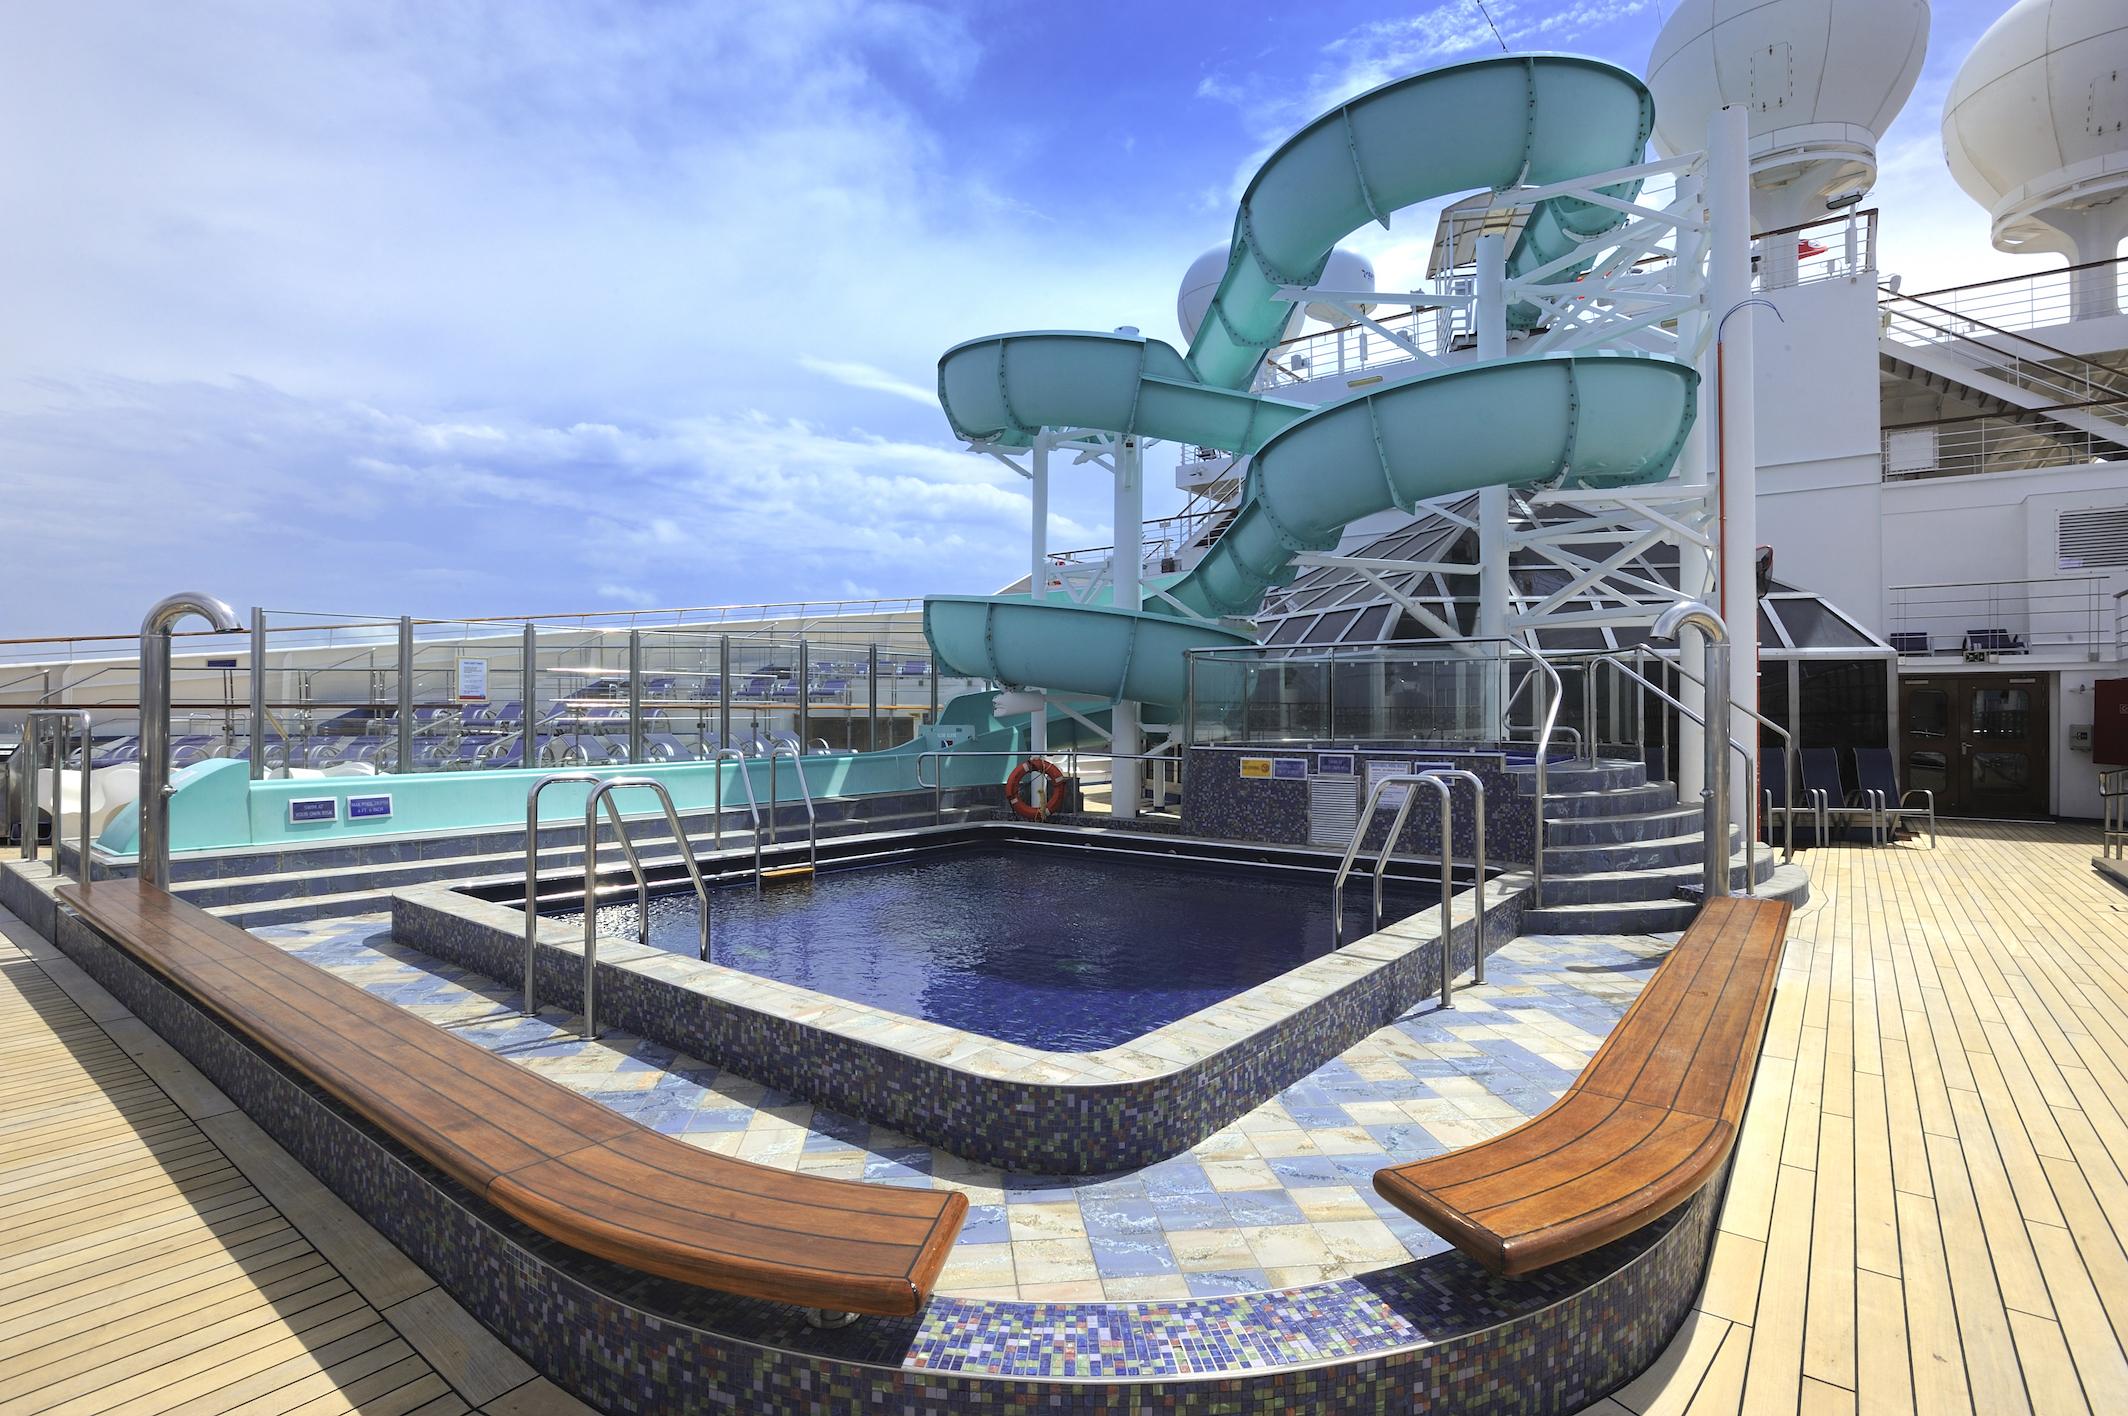 Carnival Liberty Coney Island Pool 1.jpg